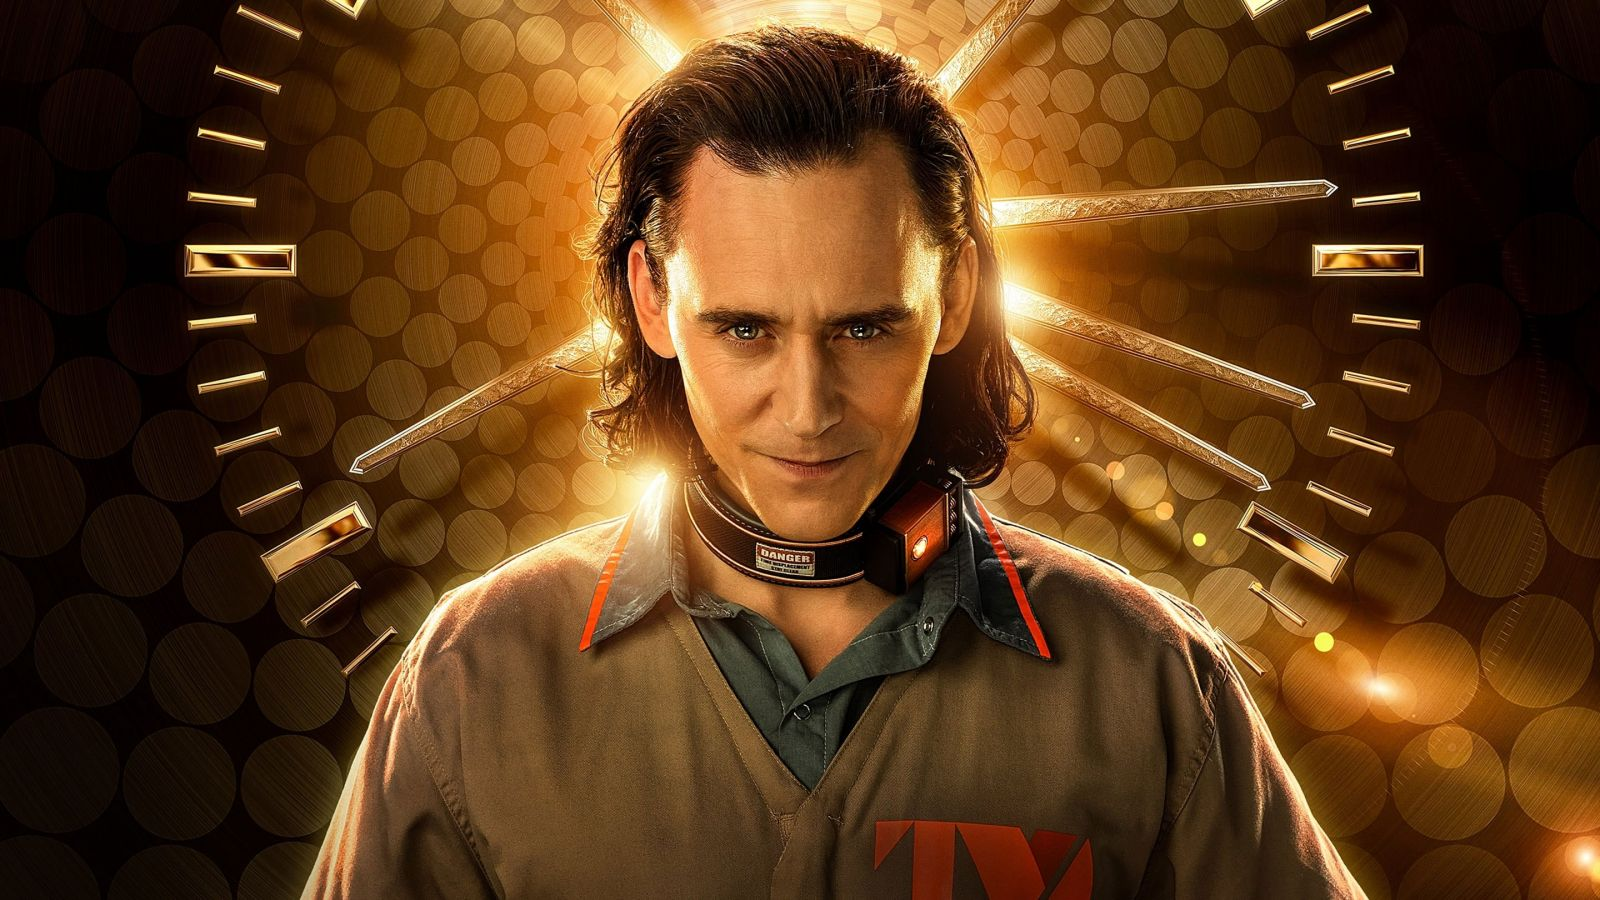 Loki (2021) Session 1 Full Movies Watch Online Free Full HD 1080P